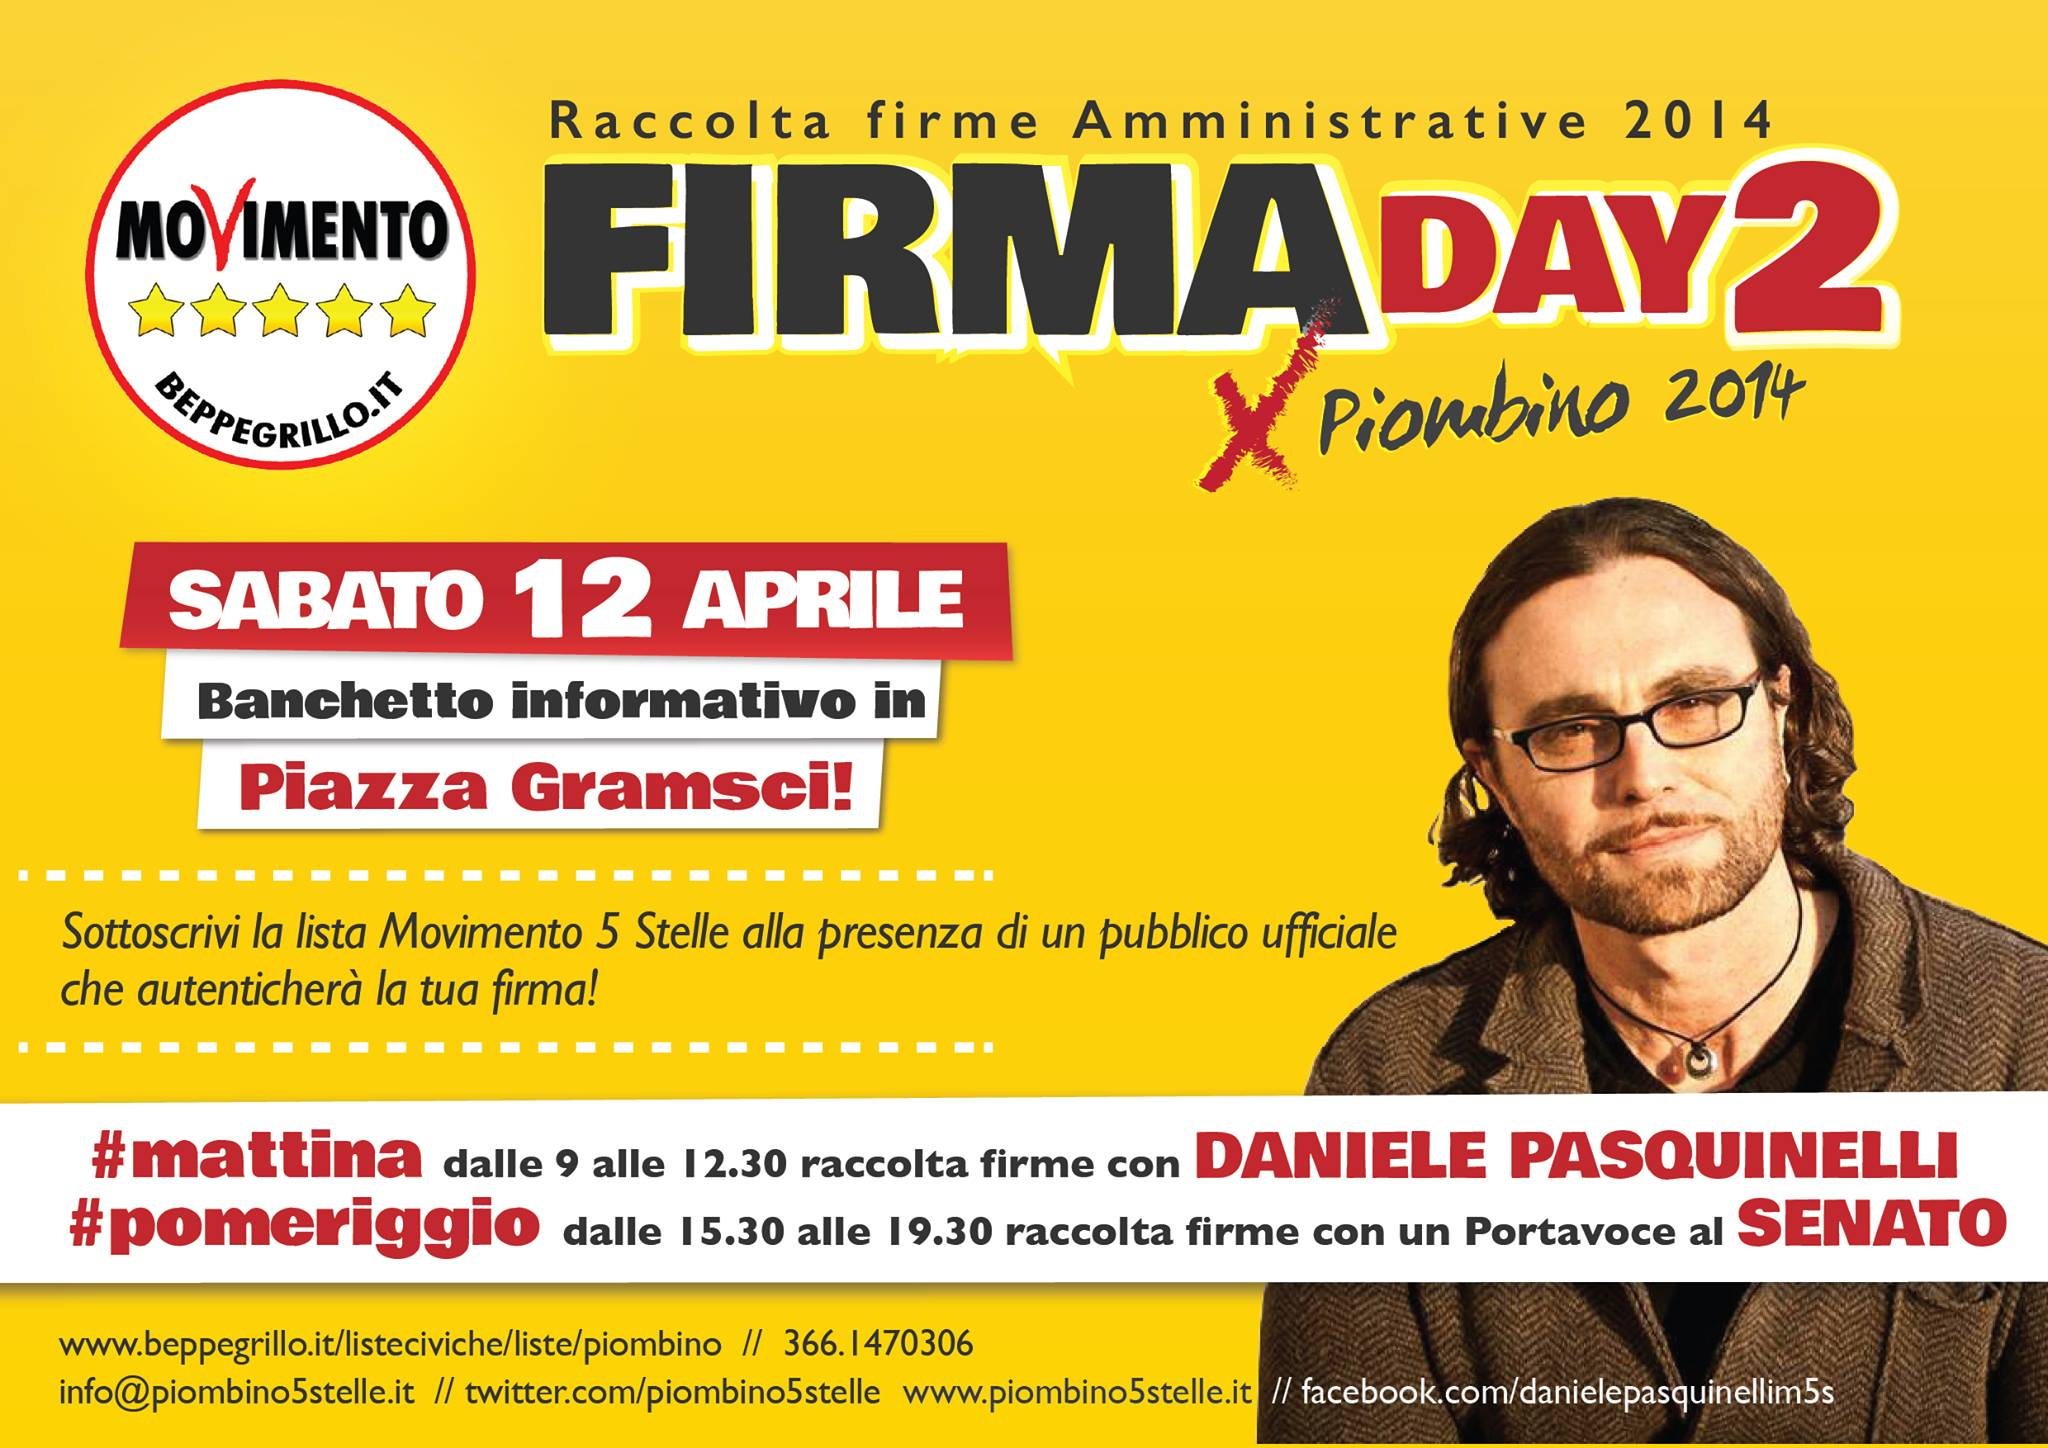 Firma day 2